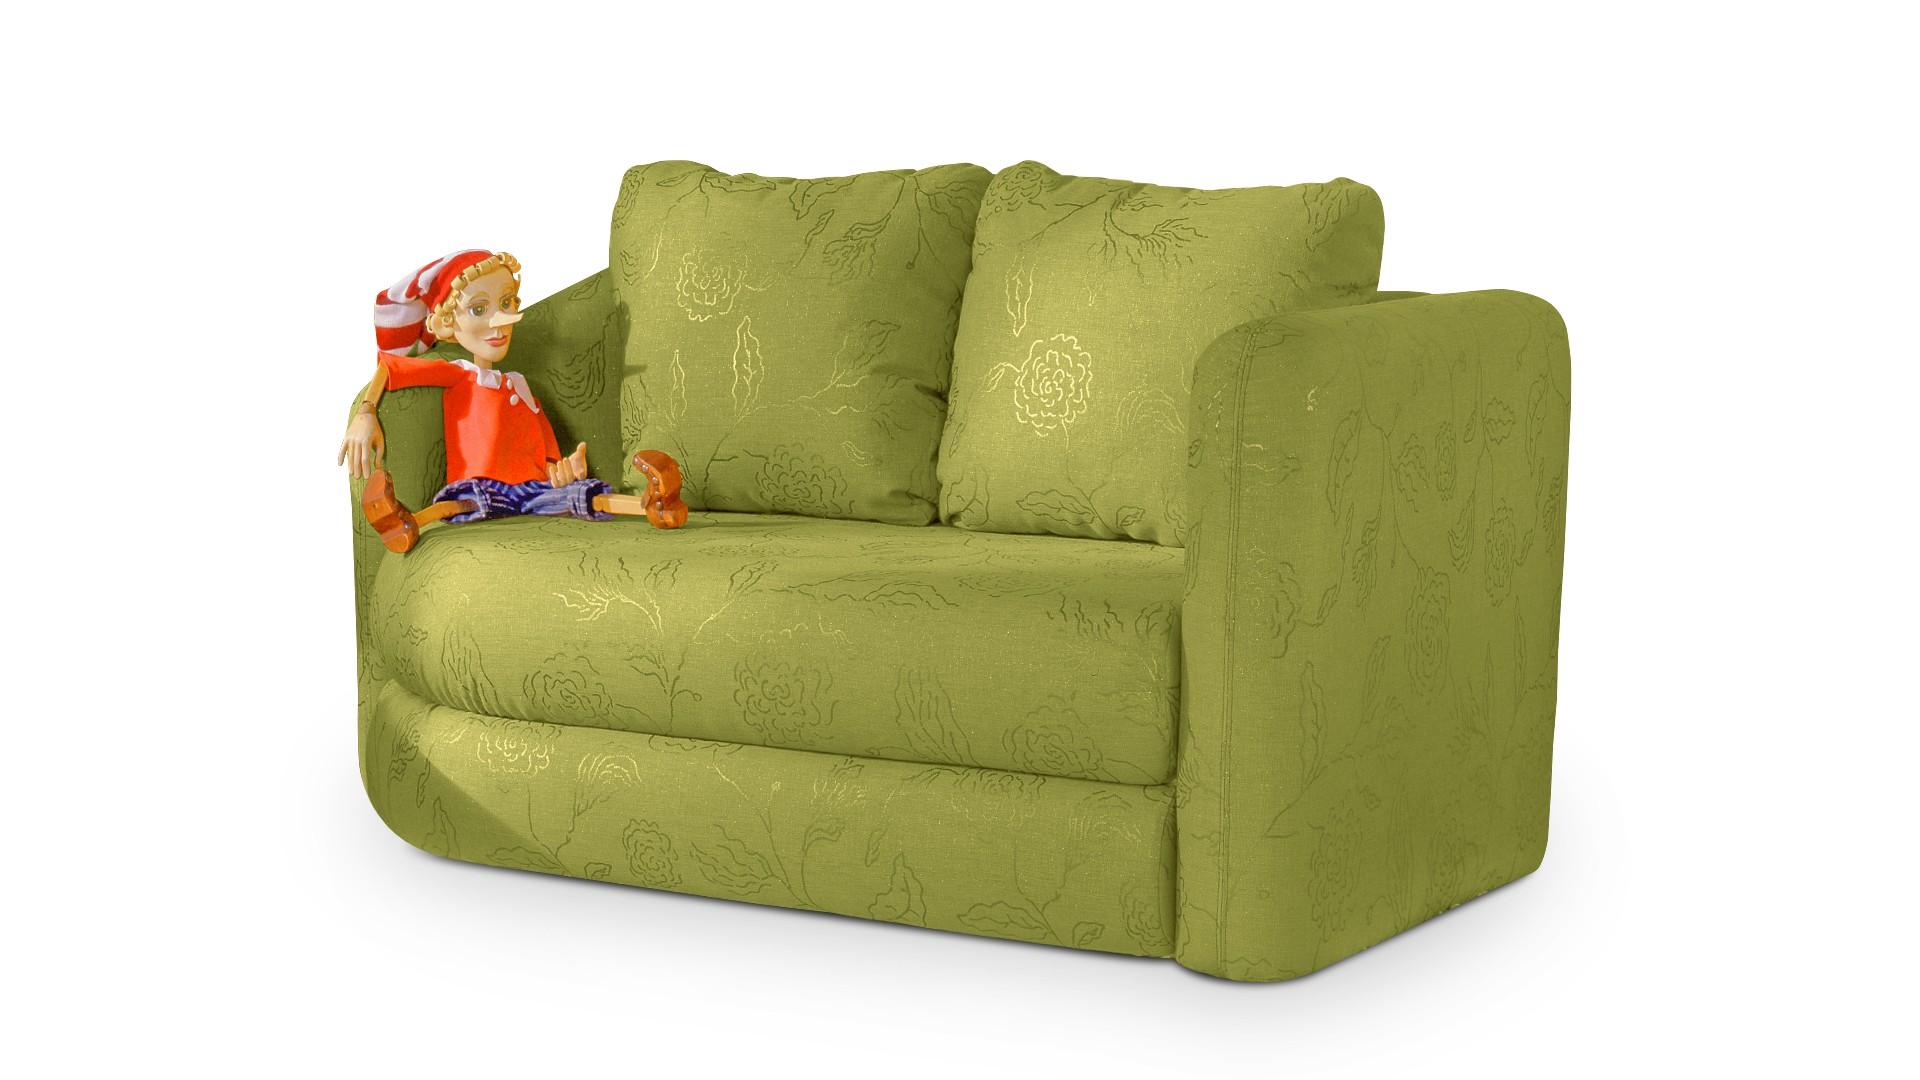 Диван майя (fiesta) зеленый 147x80x90 см.